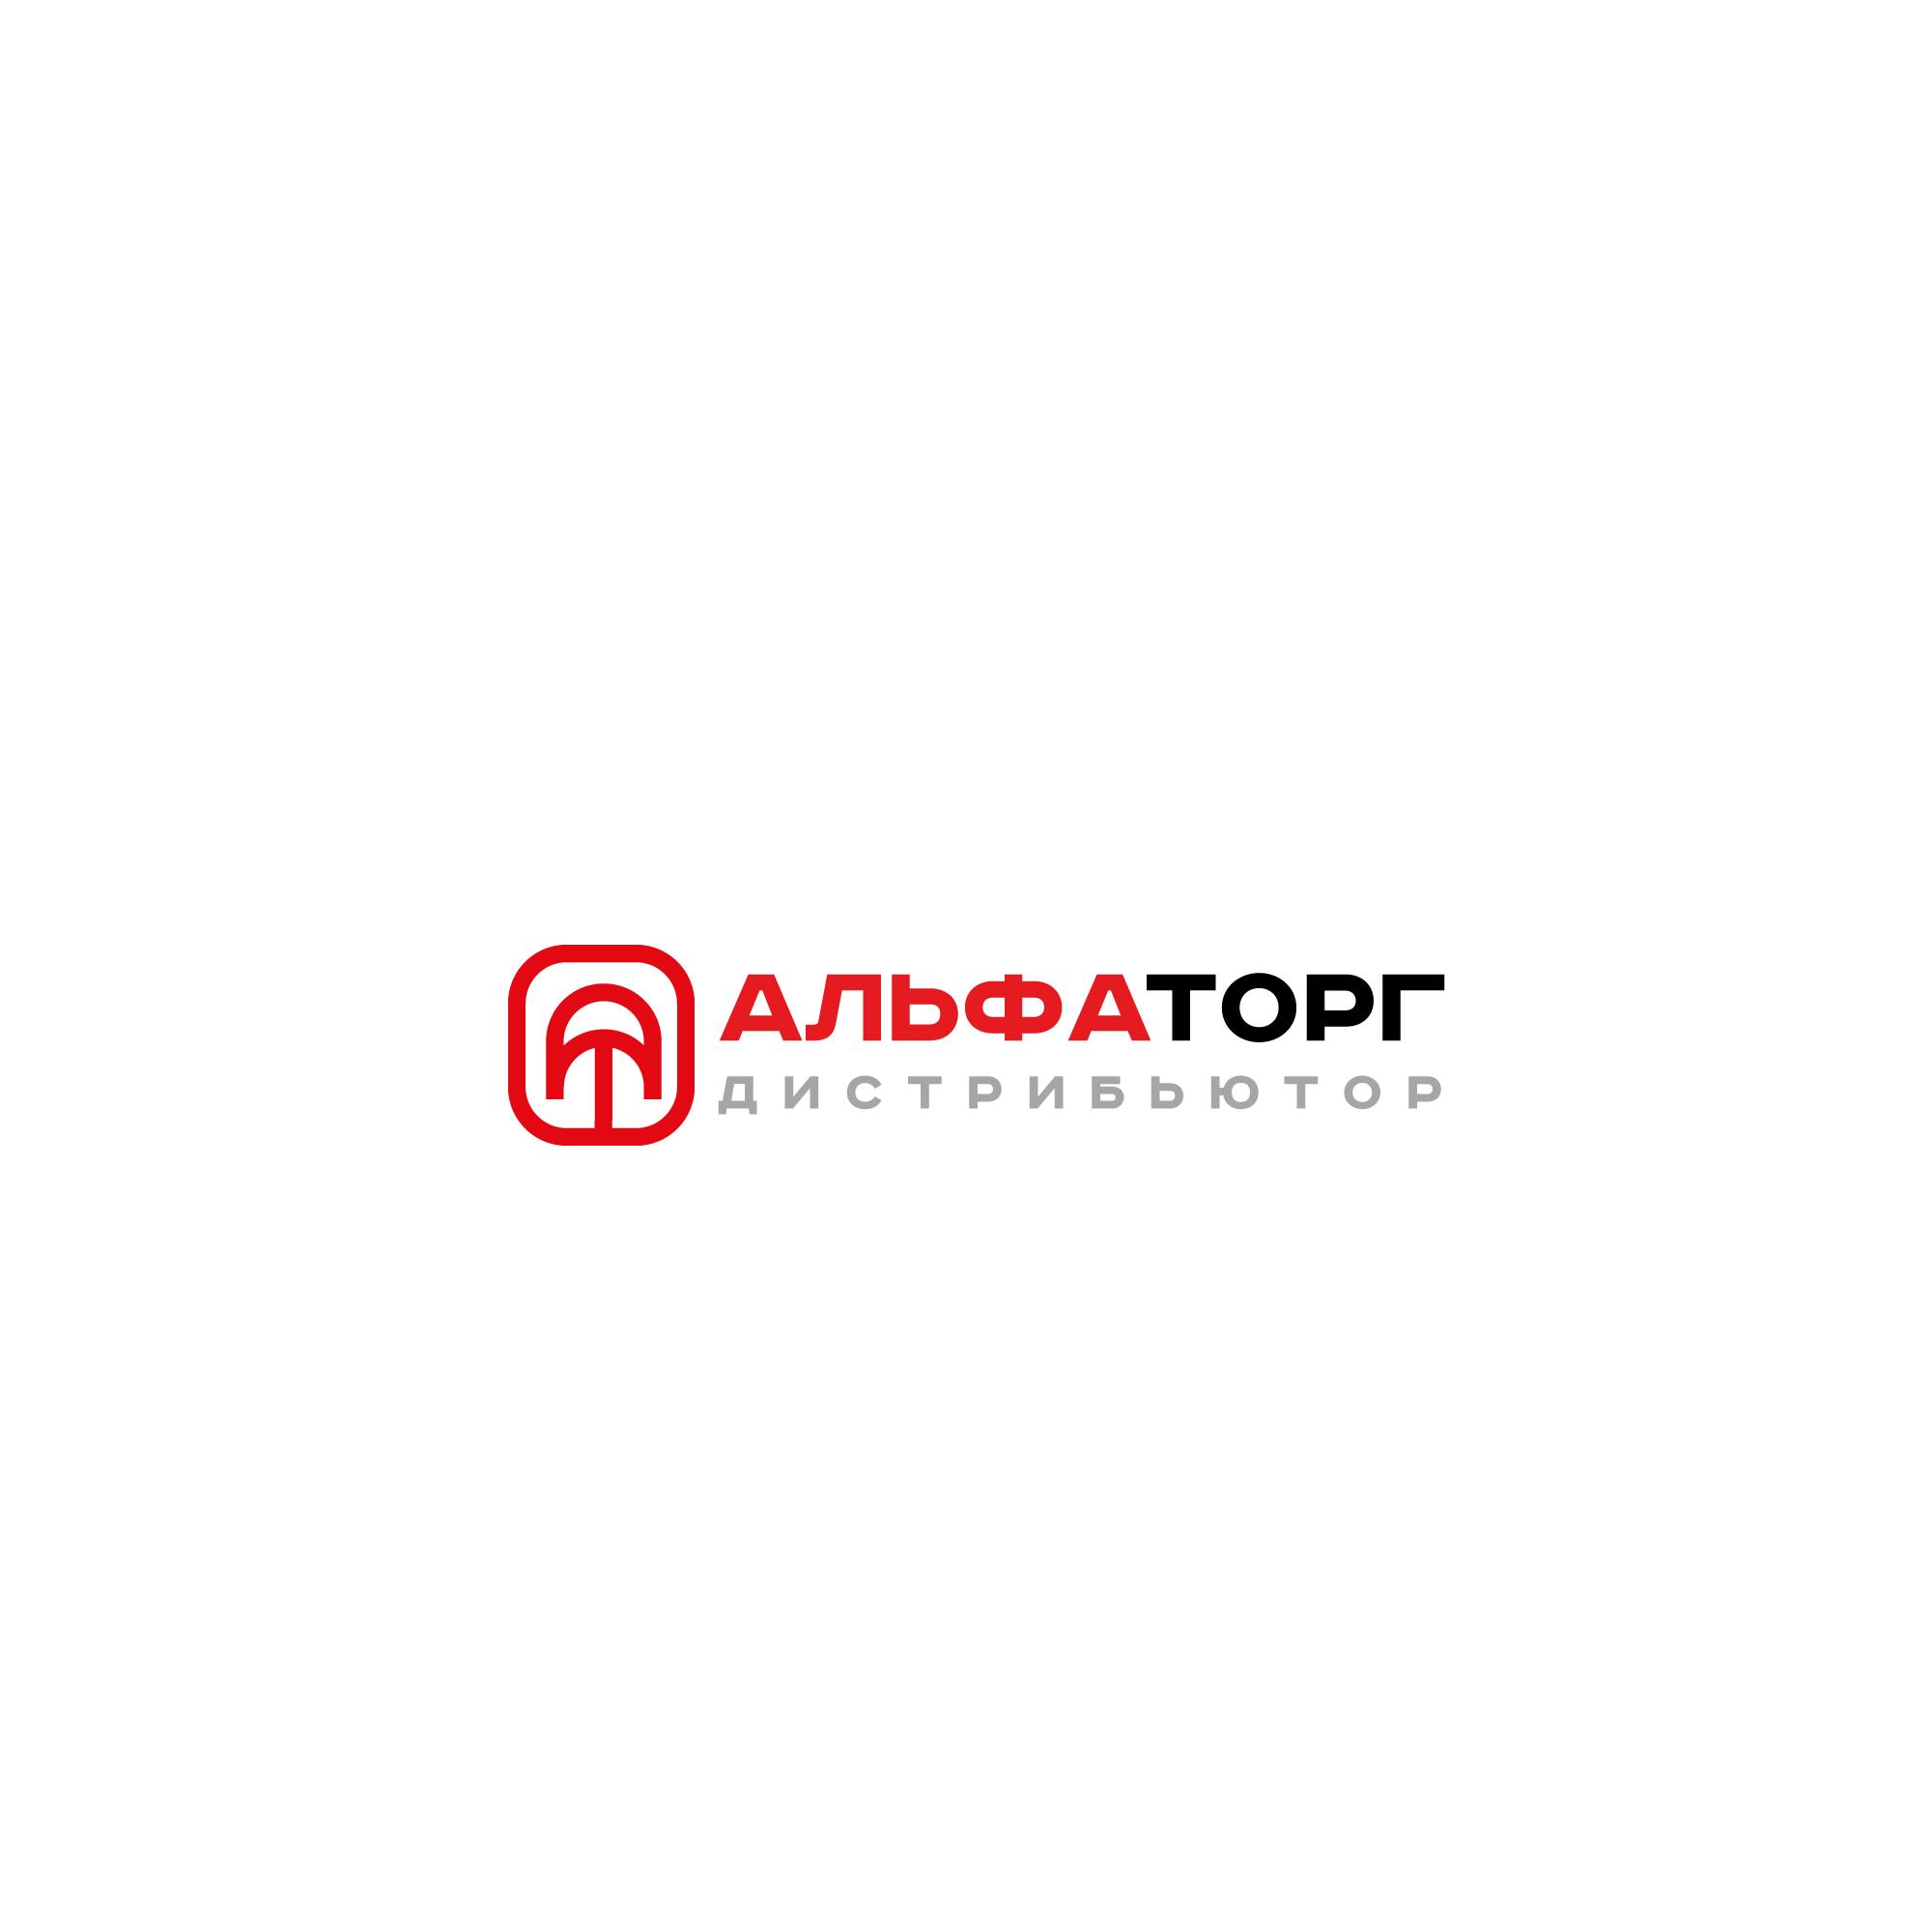 Логотип и фирменный стиль фото f_3665f02ef43c09a3.jpg